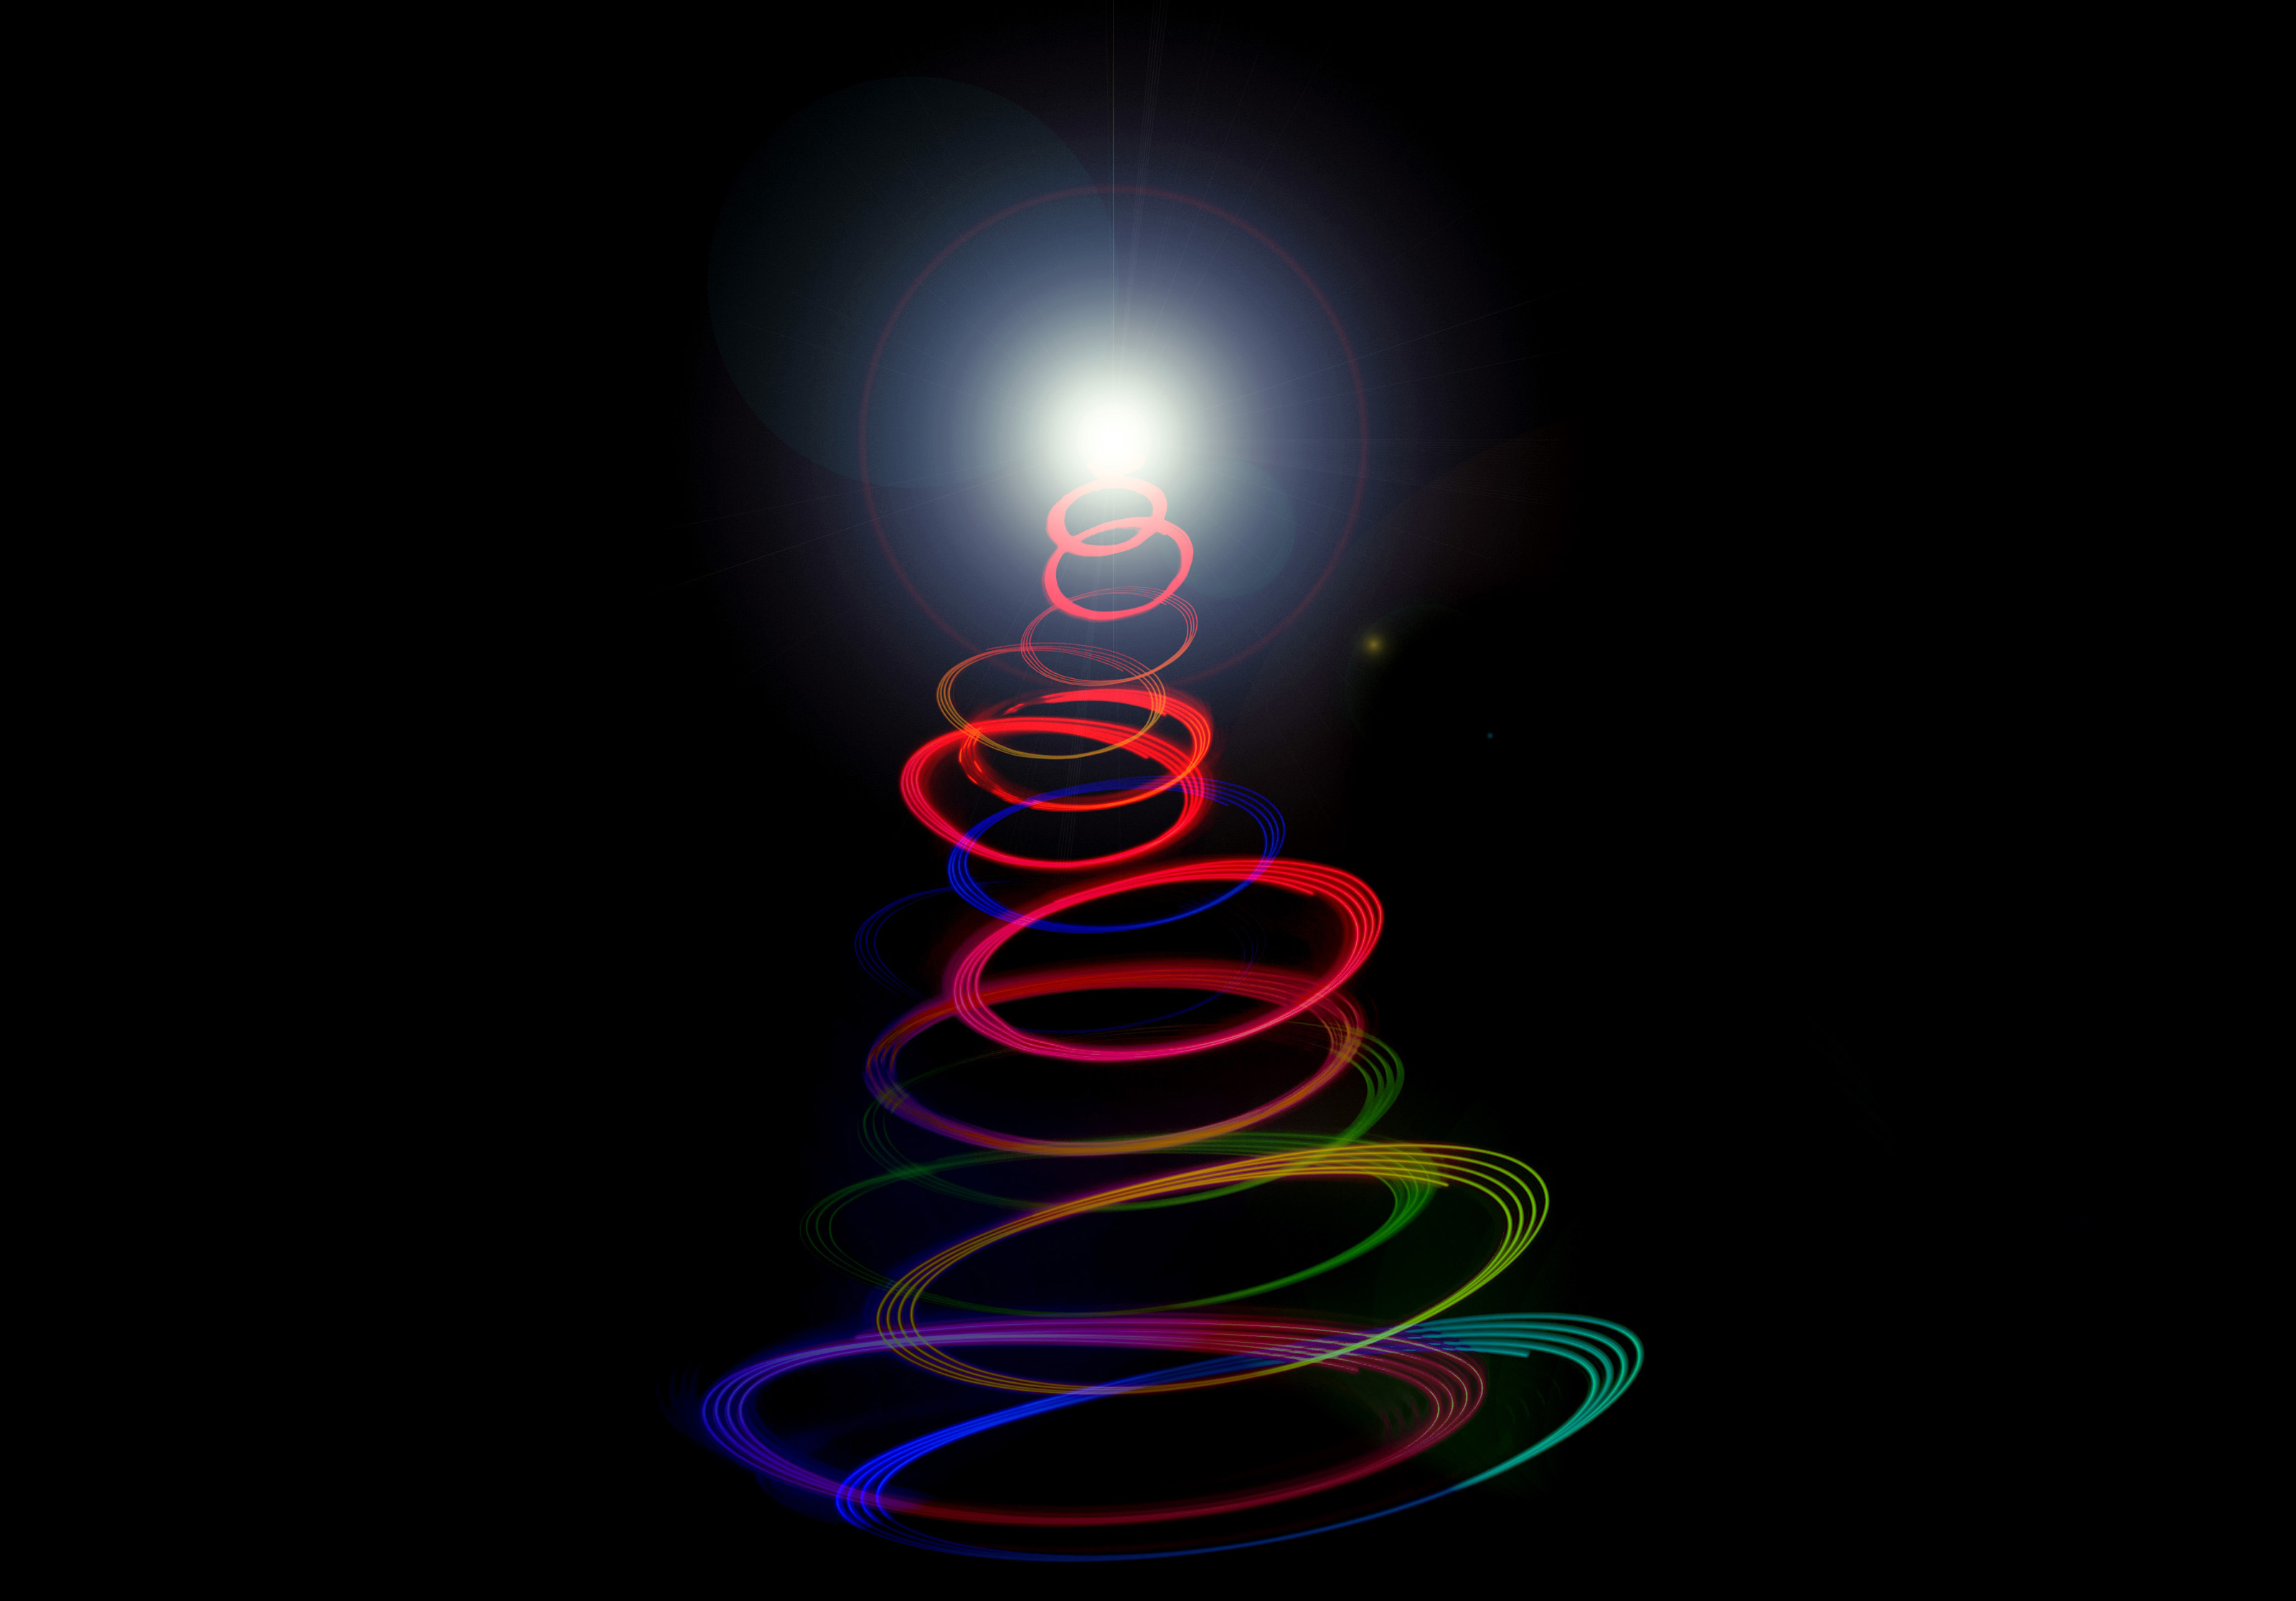 free stock photo 8638 abstract twirled christmas tree light